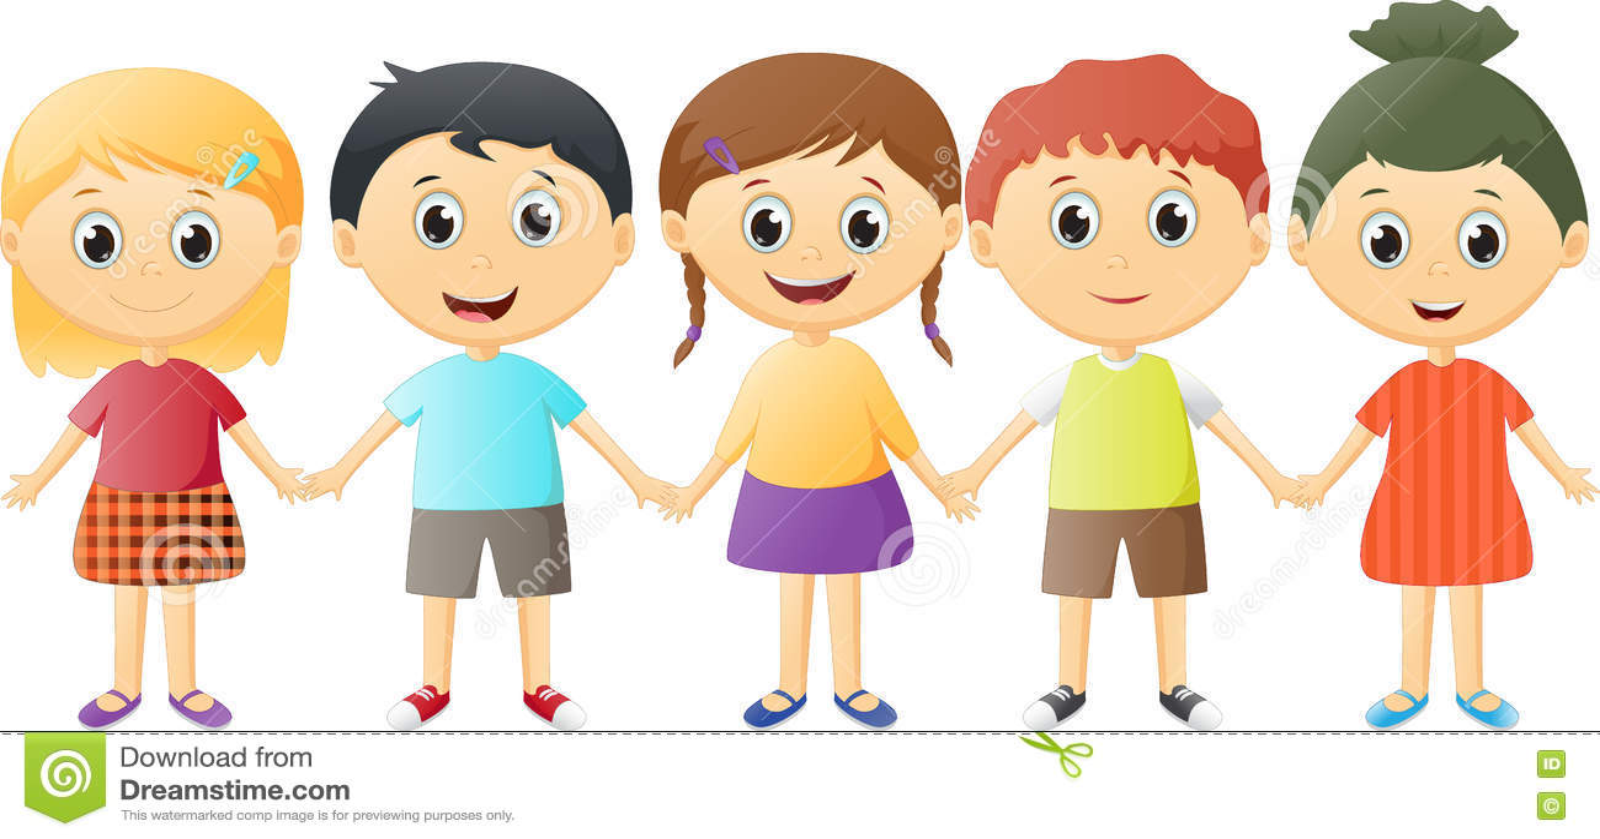 Small Children Holding Hands Stock Vector